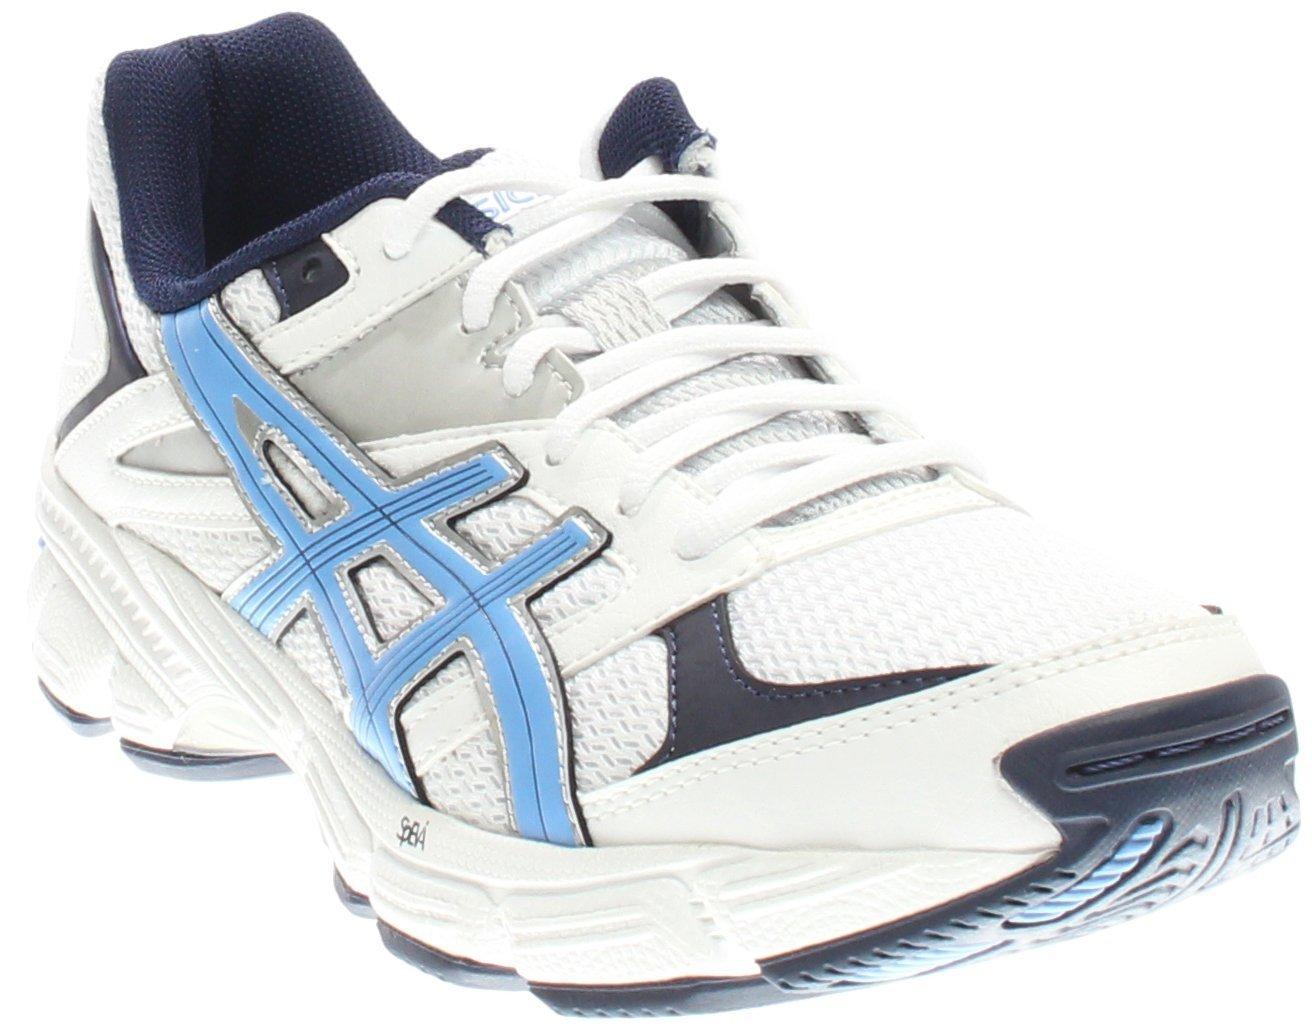 ASICS Women's Gel 190 TR Training Shoe, White/Periwinkle/Midnight Navy, 6.5 M US